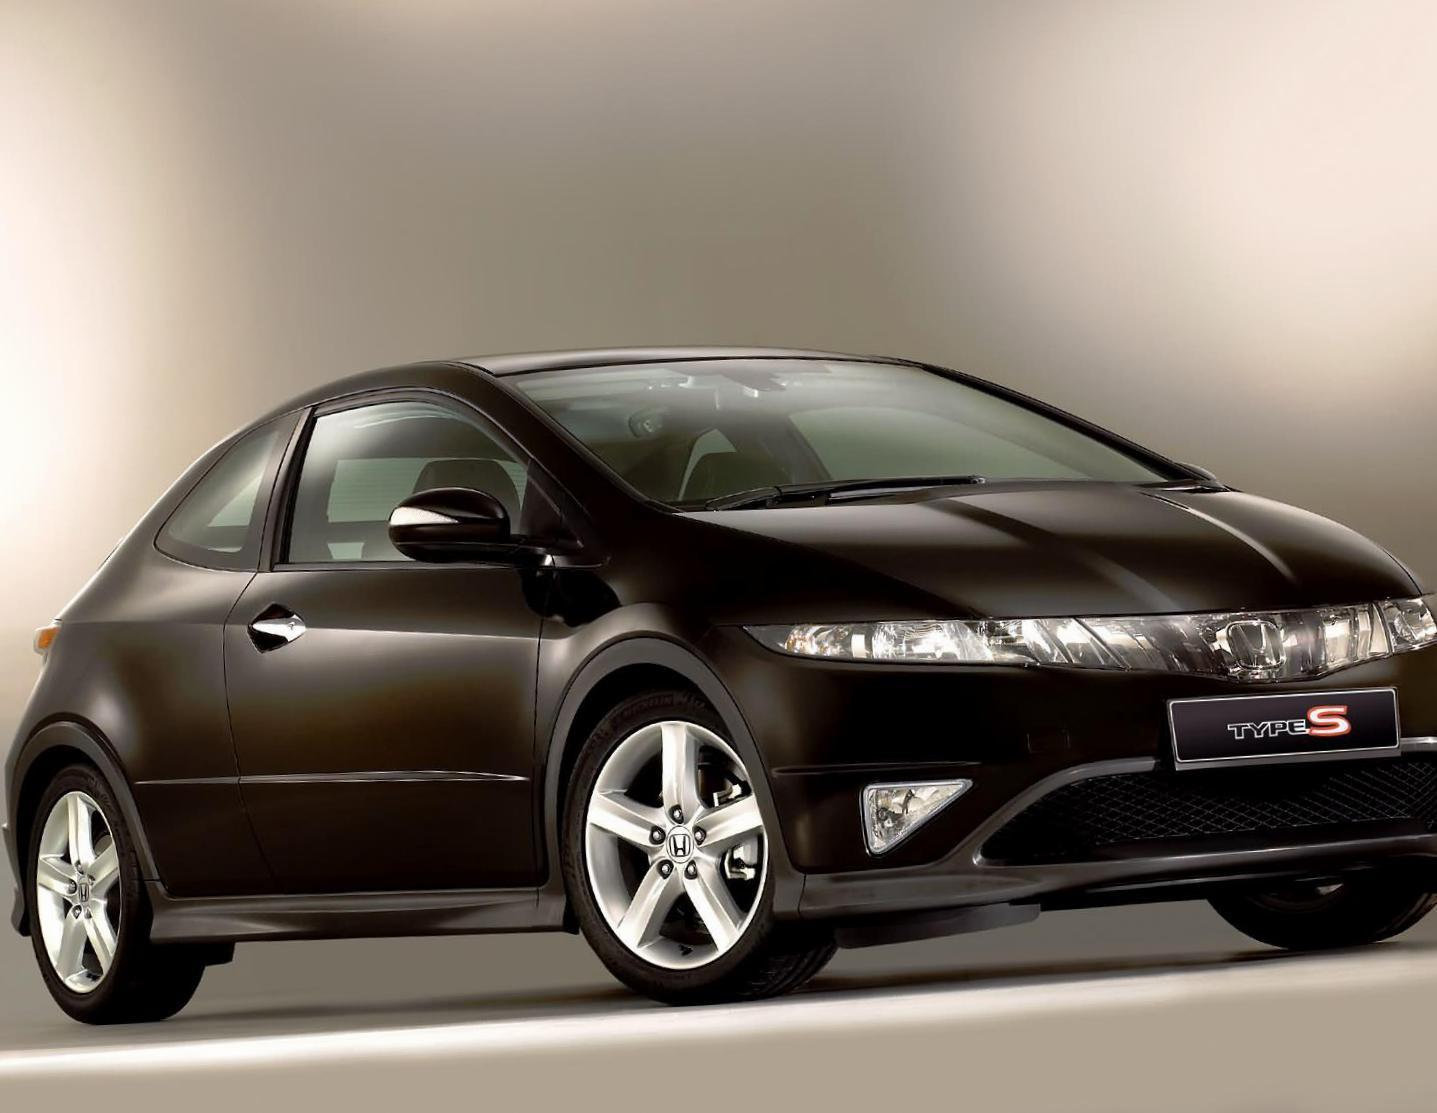 Kelebihan Civic Type S Harga